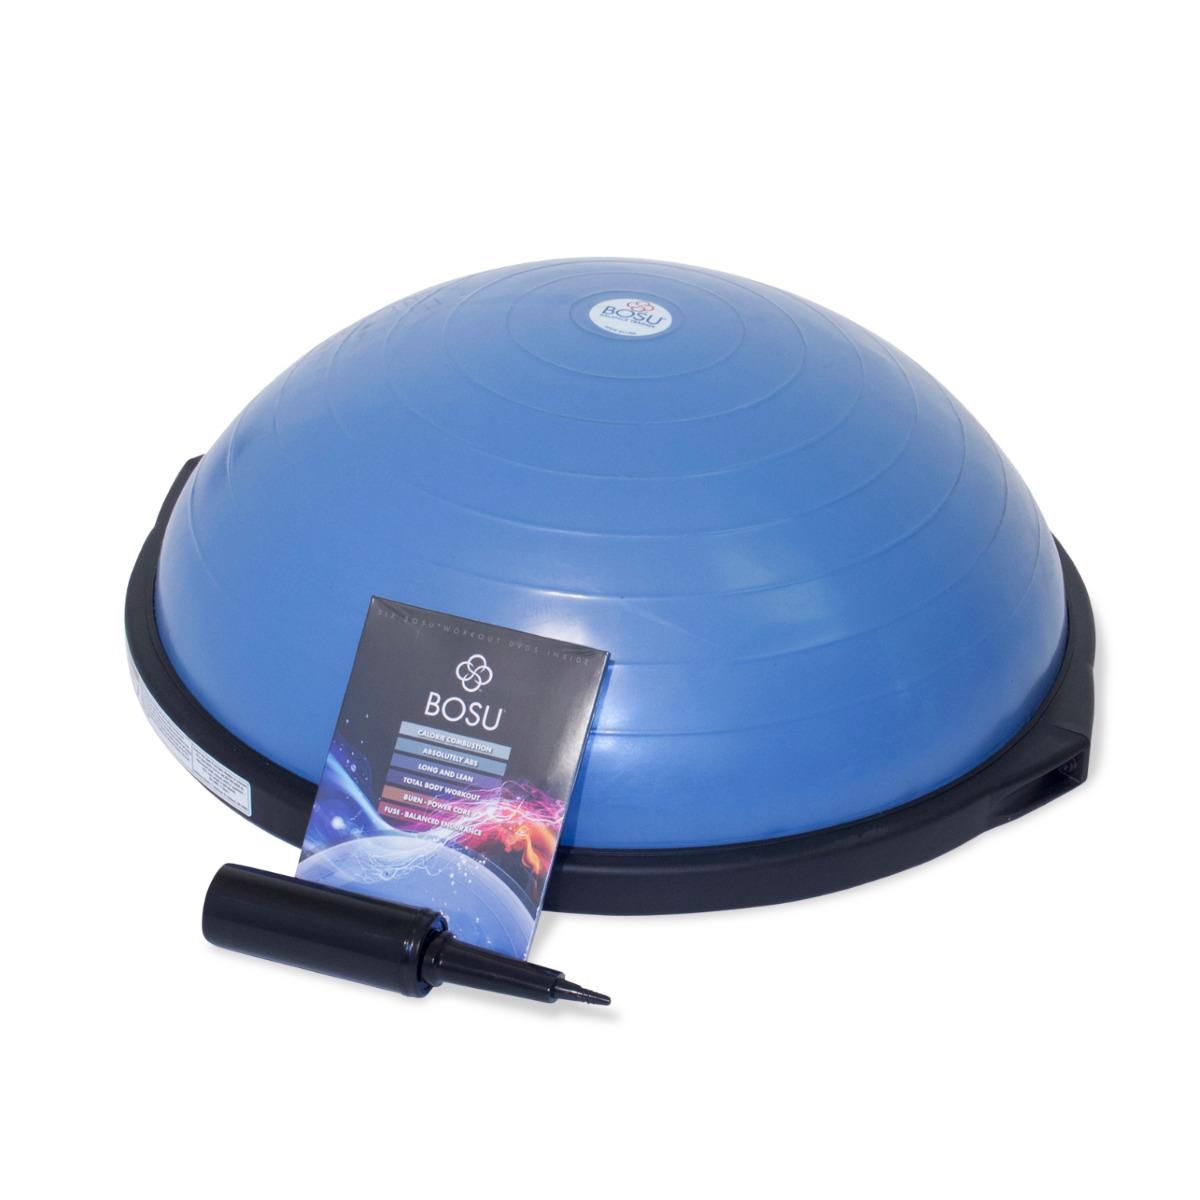 BOSU Balance Trainer (Home Model)